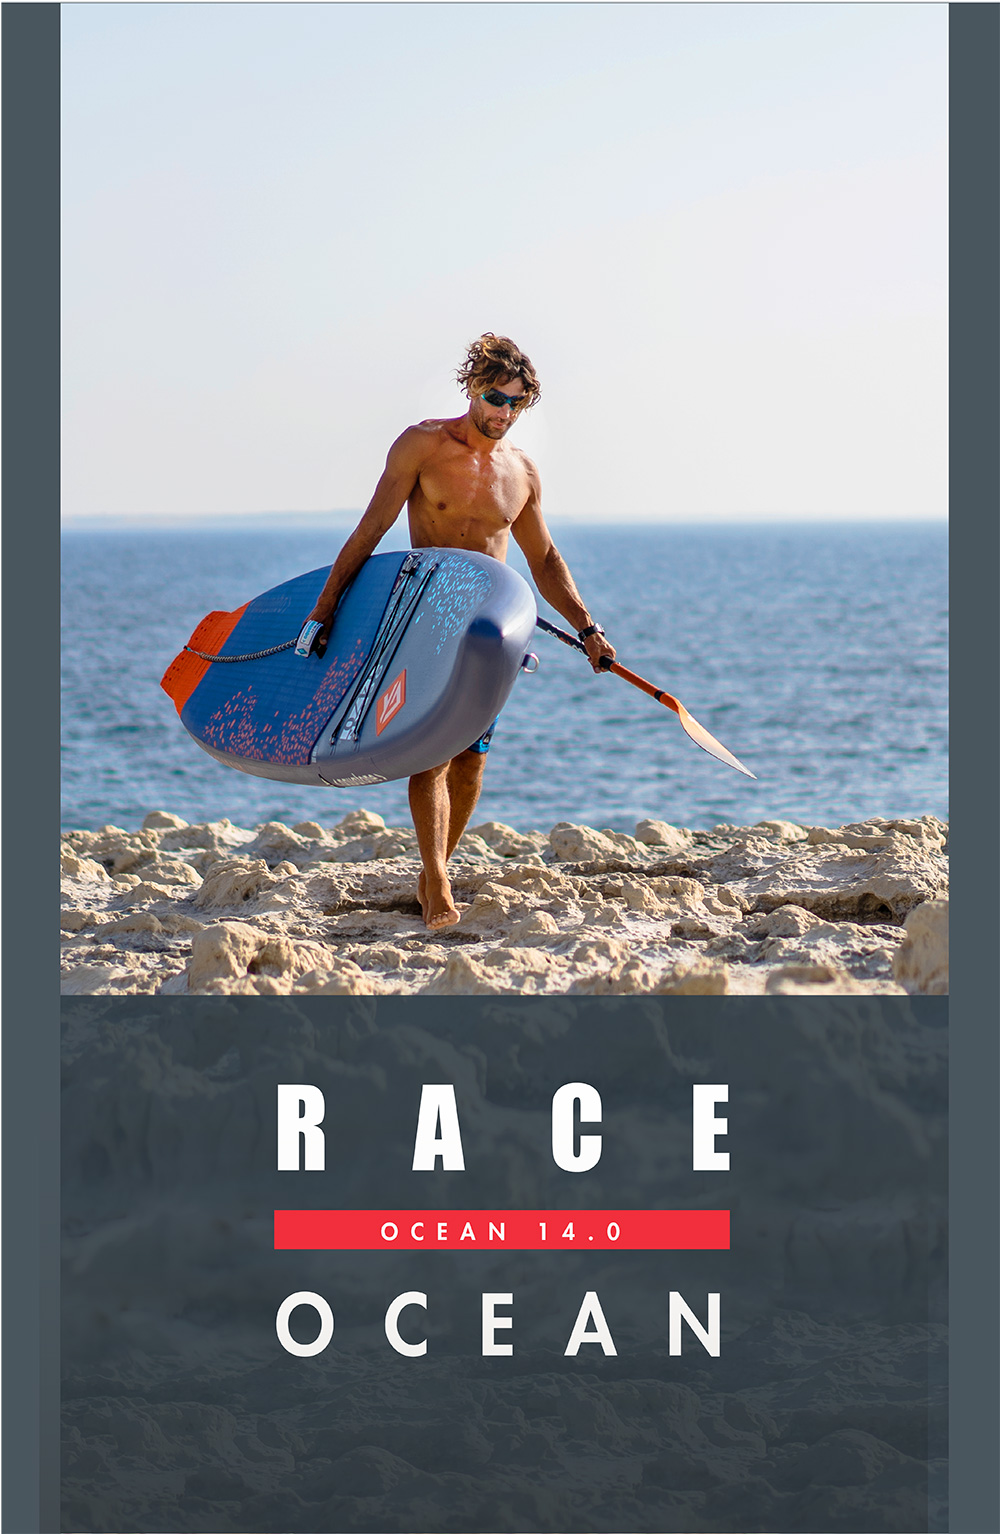 RACE SUP image